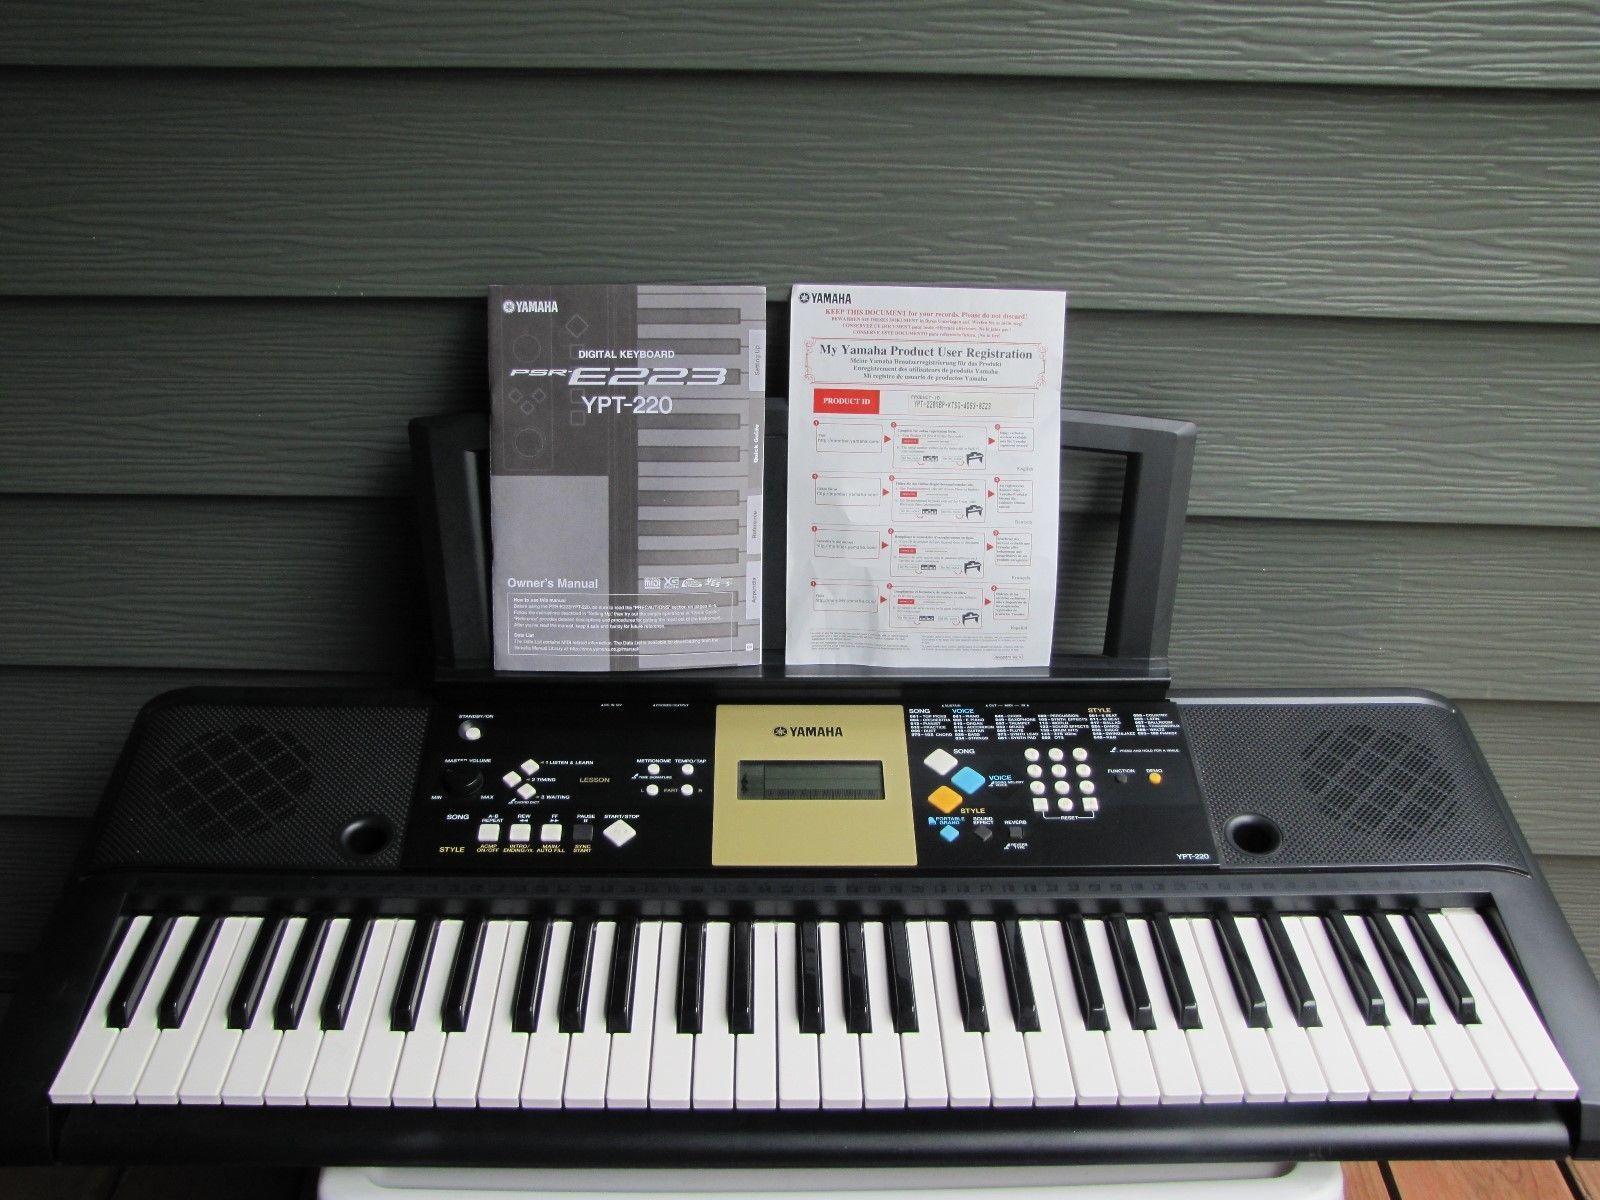 yamaha electronic keyboard model ypt 220 iob and 50 similar items rh bonanza com User Manual User Manual